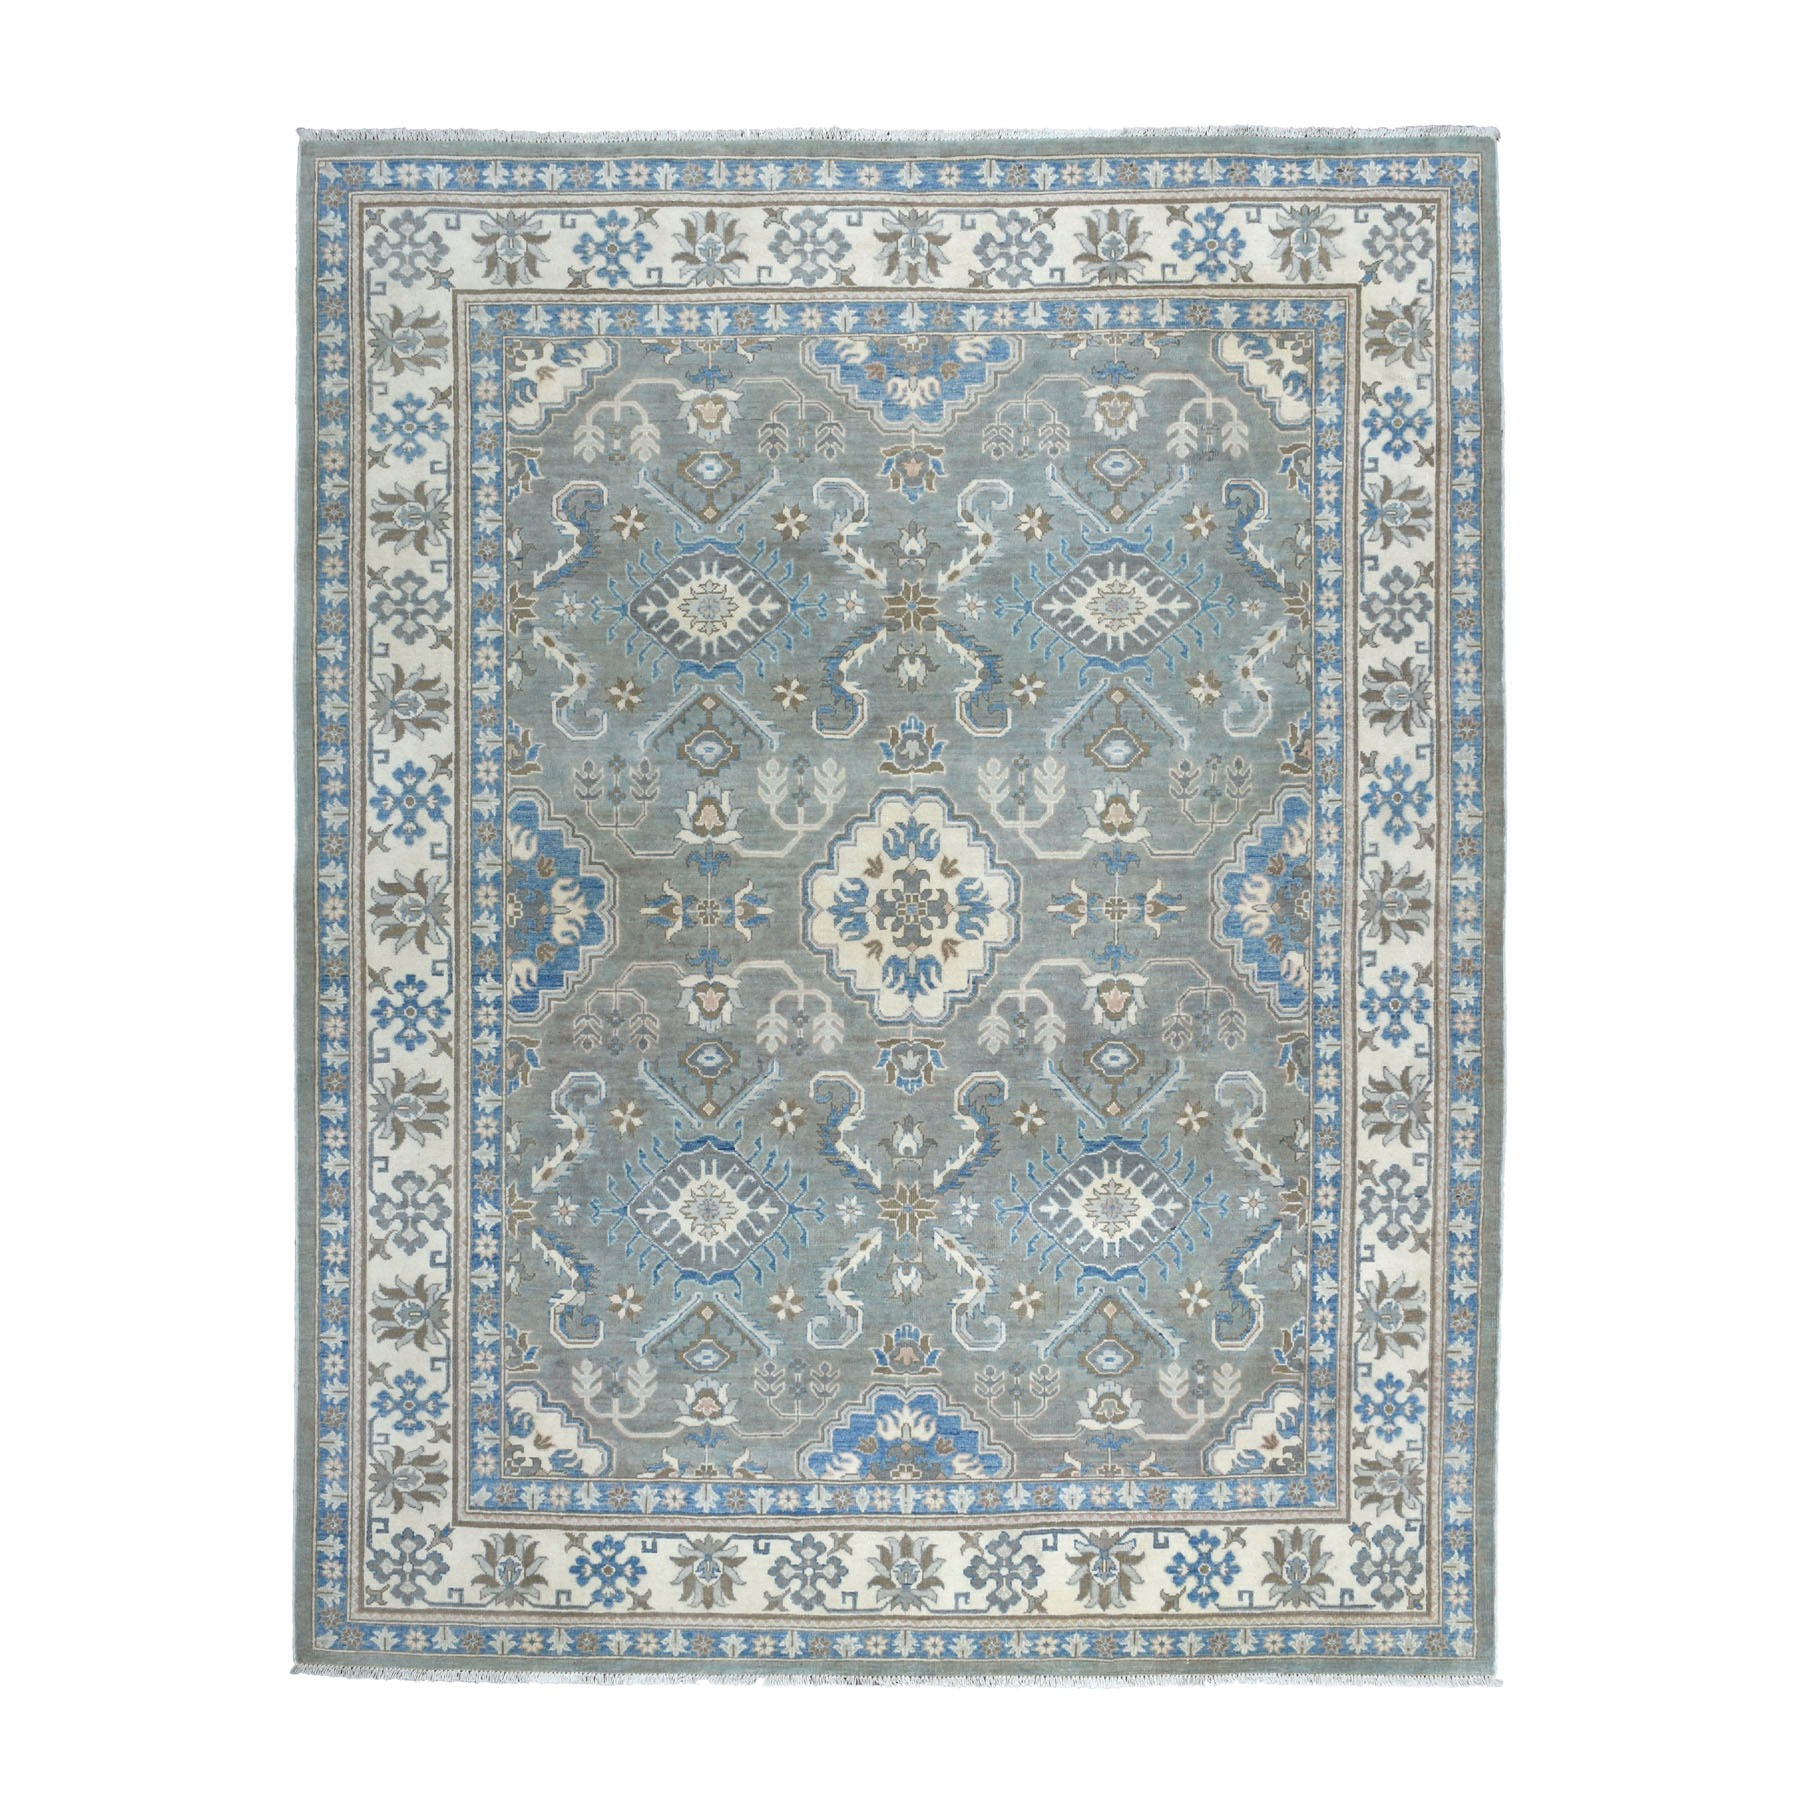 "8'X9'9"" Gray Vintage Look Kazak Geometric Design Pure Wool Hand Knotted Oriental Rug moaebe00"